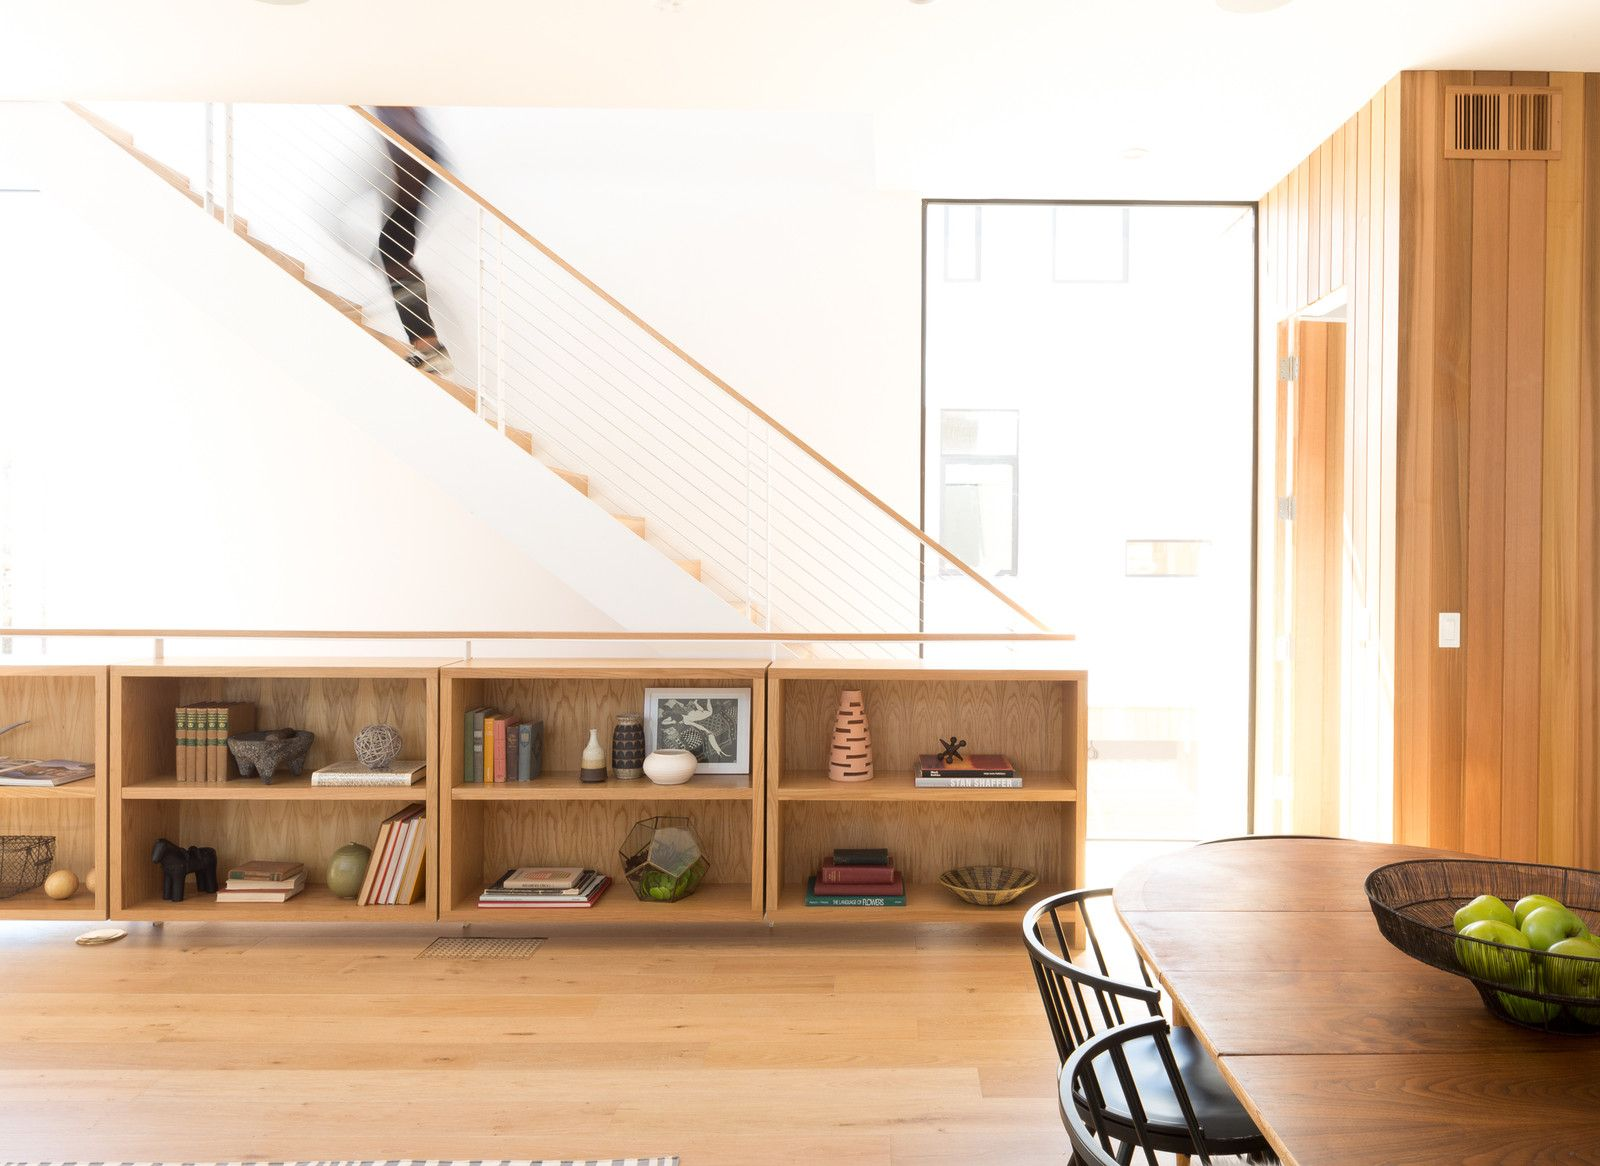 A Small Development In Los Feliz Offers Scandinavian Inspired Urban Living Modern House White Oak Plank Floors Mid Century Modern House